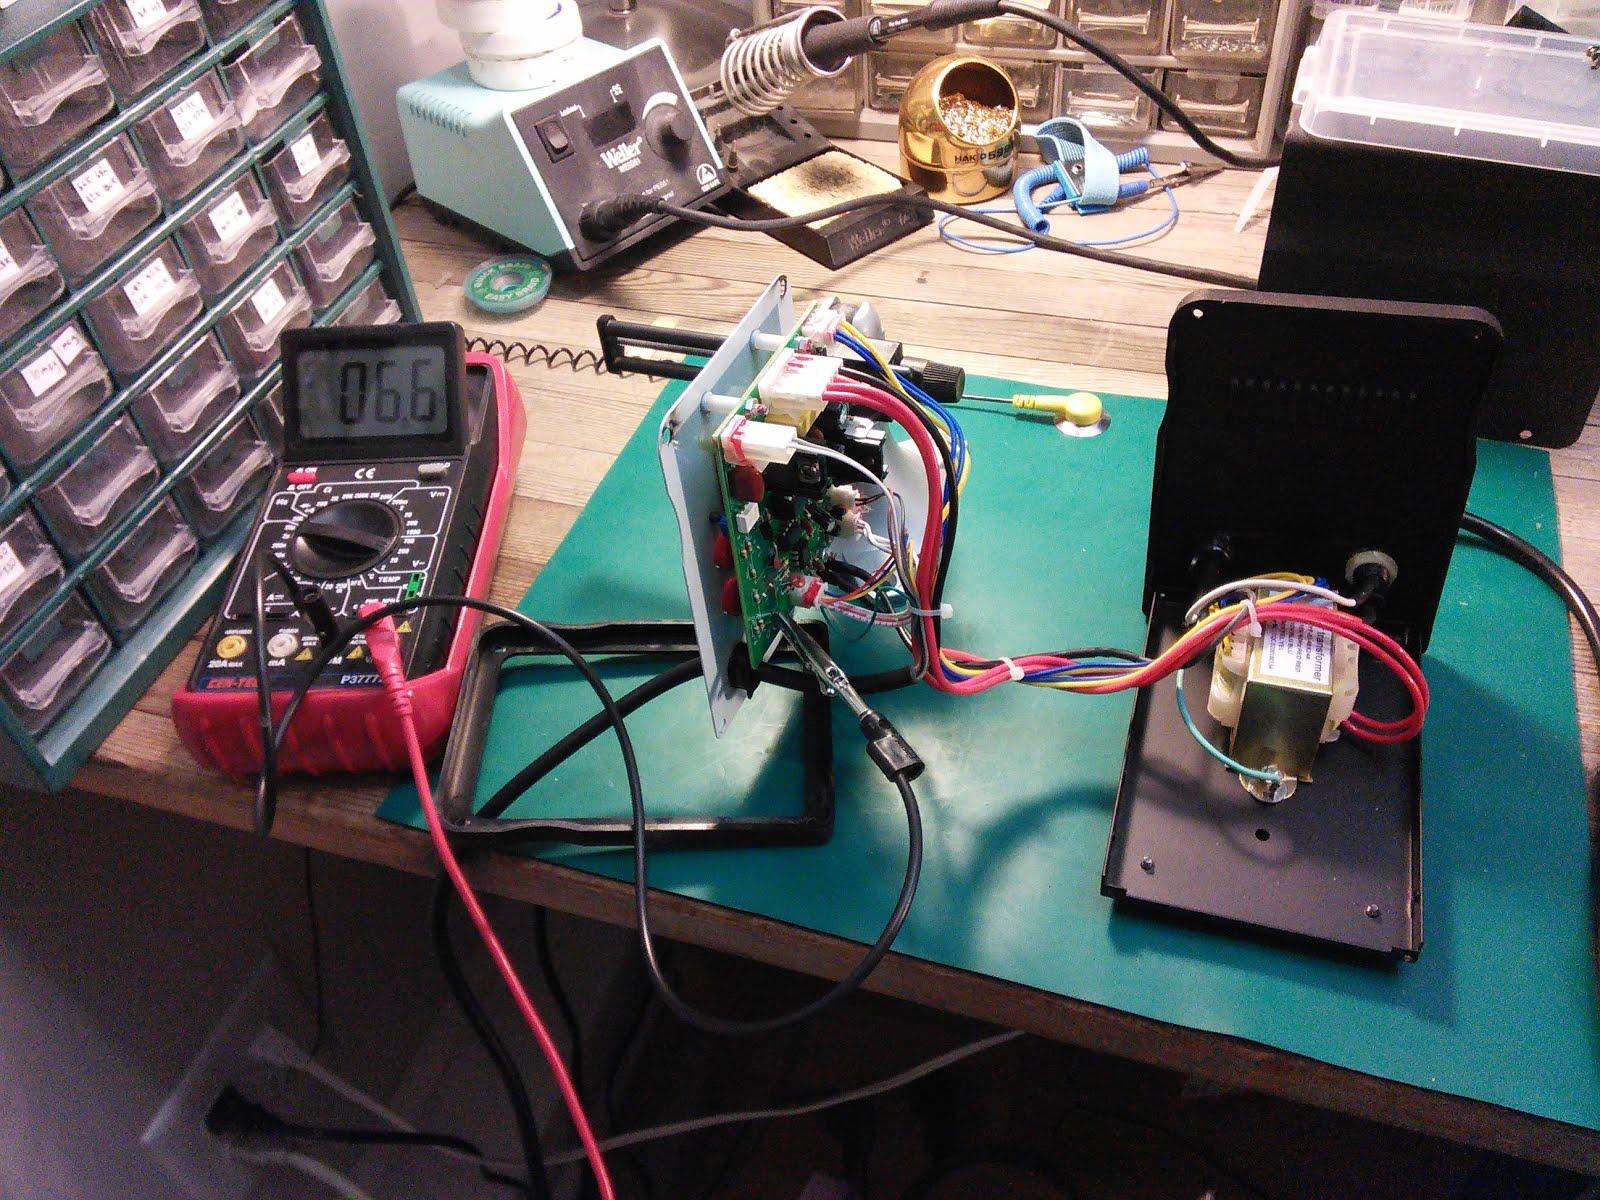 Dangerous Wiring Fault: 858D Hot Air Rework Station | William Osman